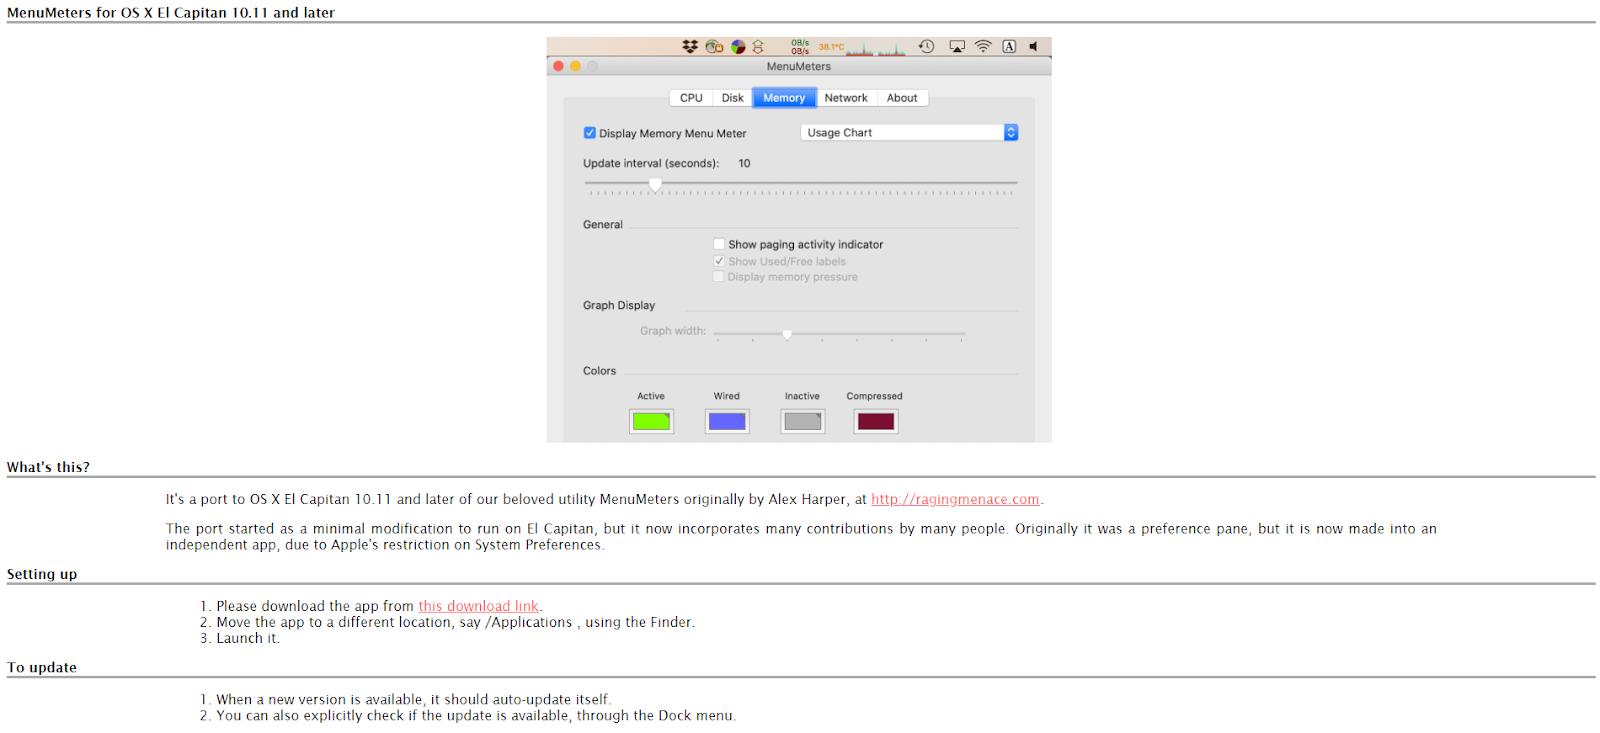 Mac Network Monitoring Software - MenuMeters